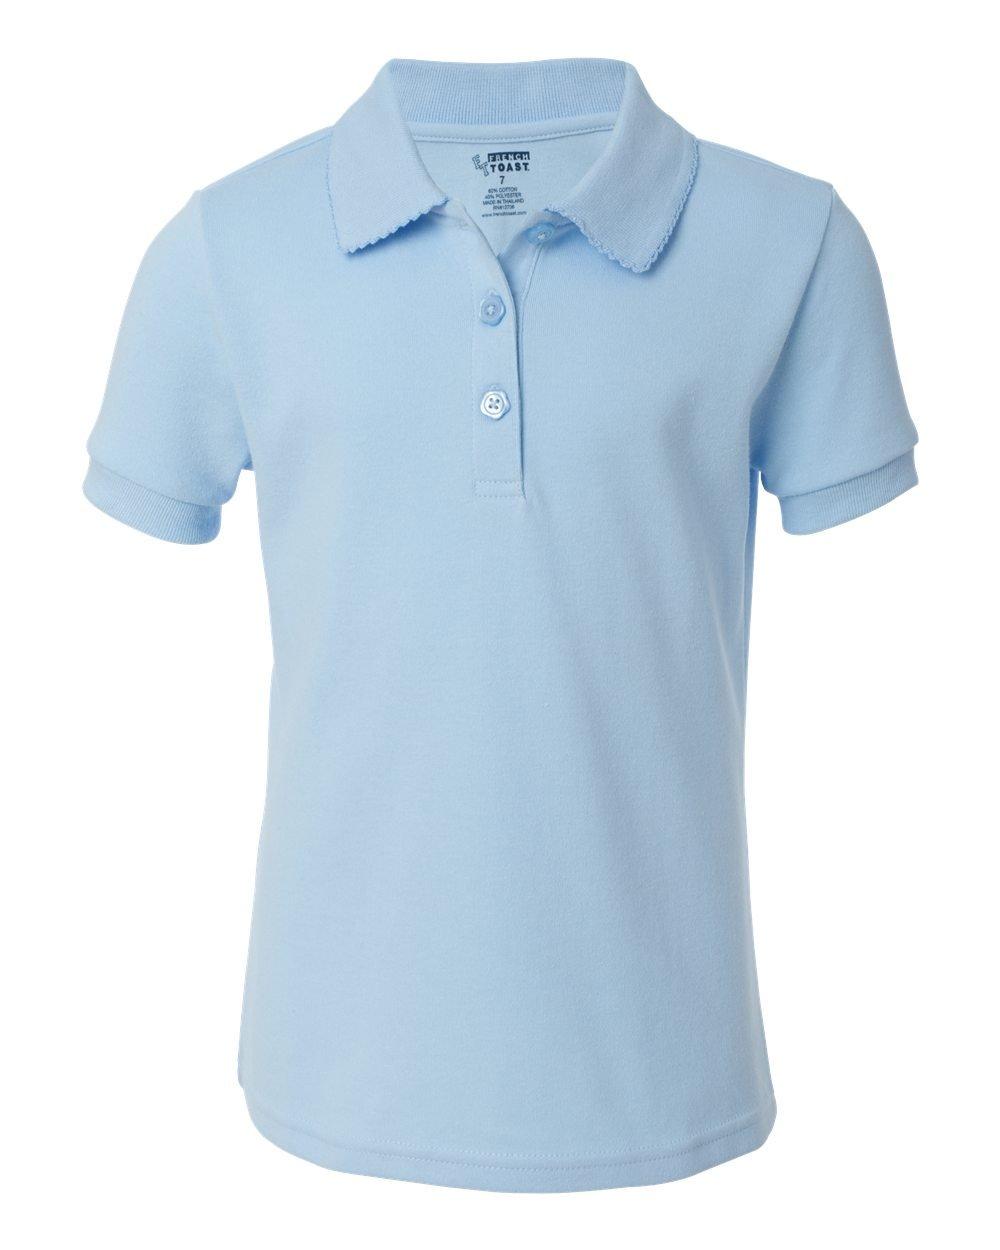 French Toast School Uniform Girls Short Sleeve Interlock w/ Picot Collar, Blue, 16